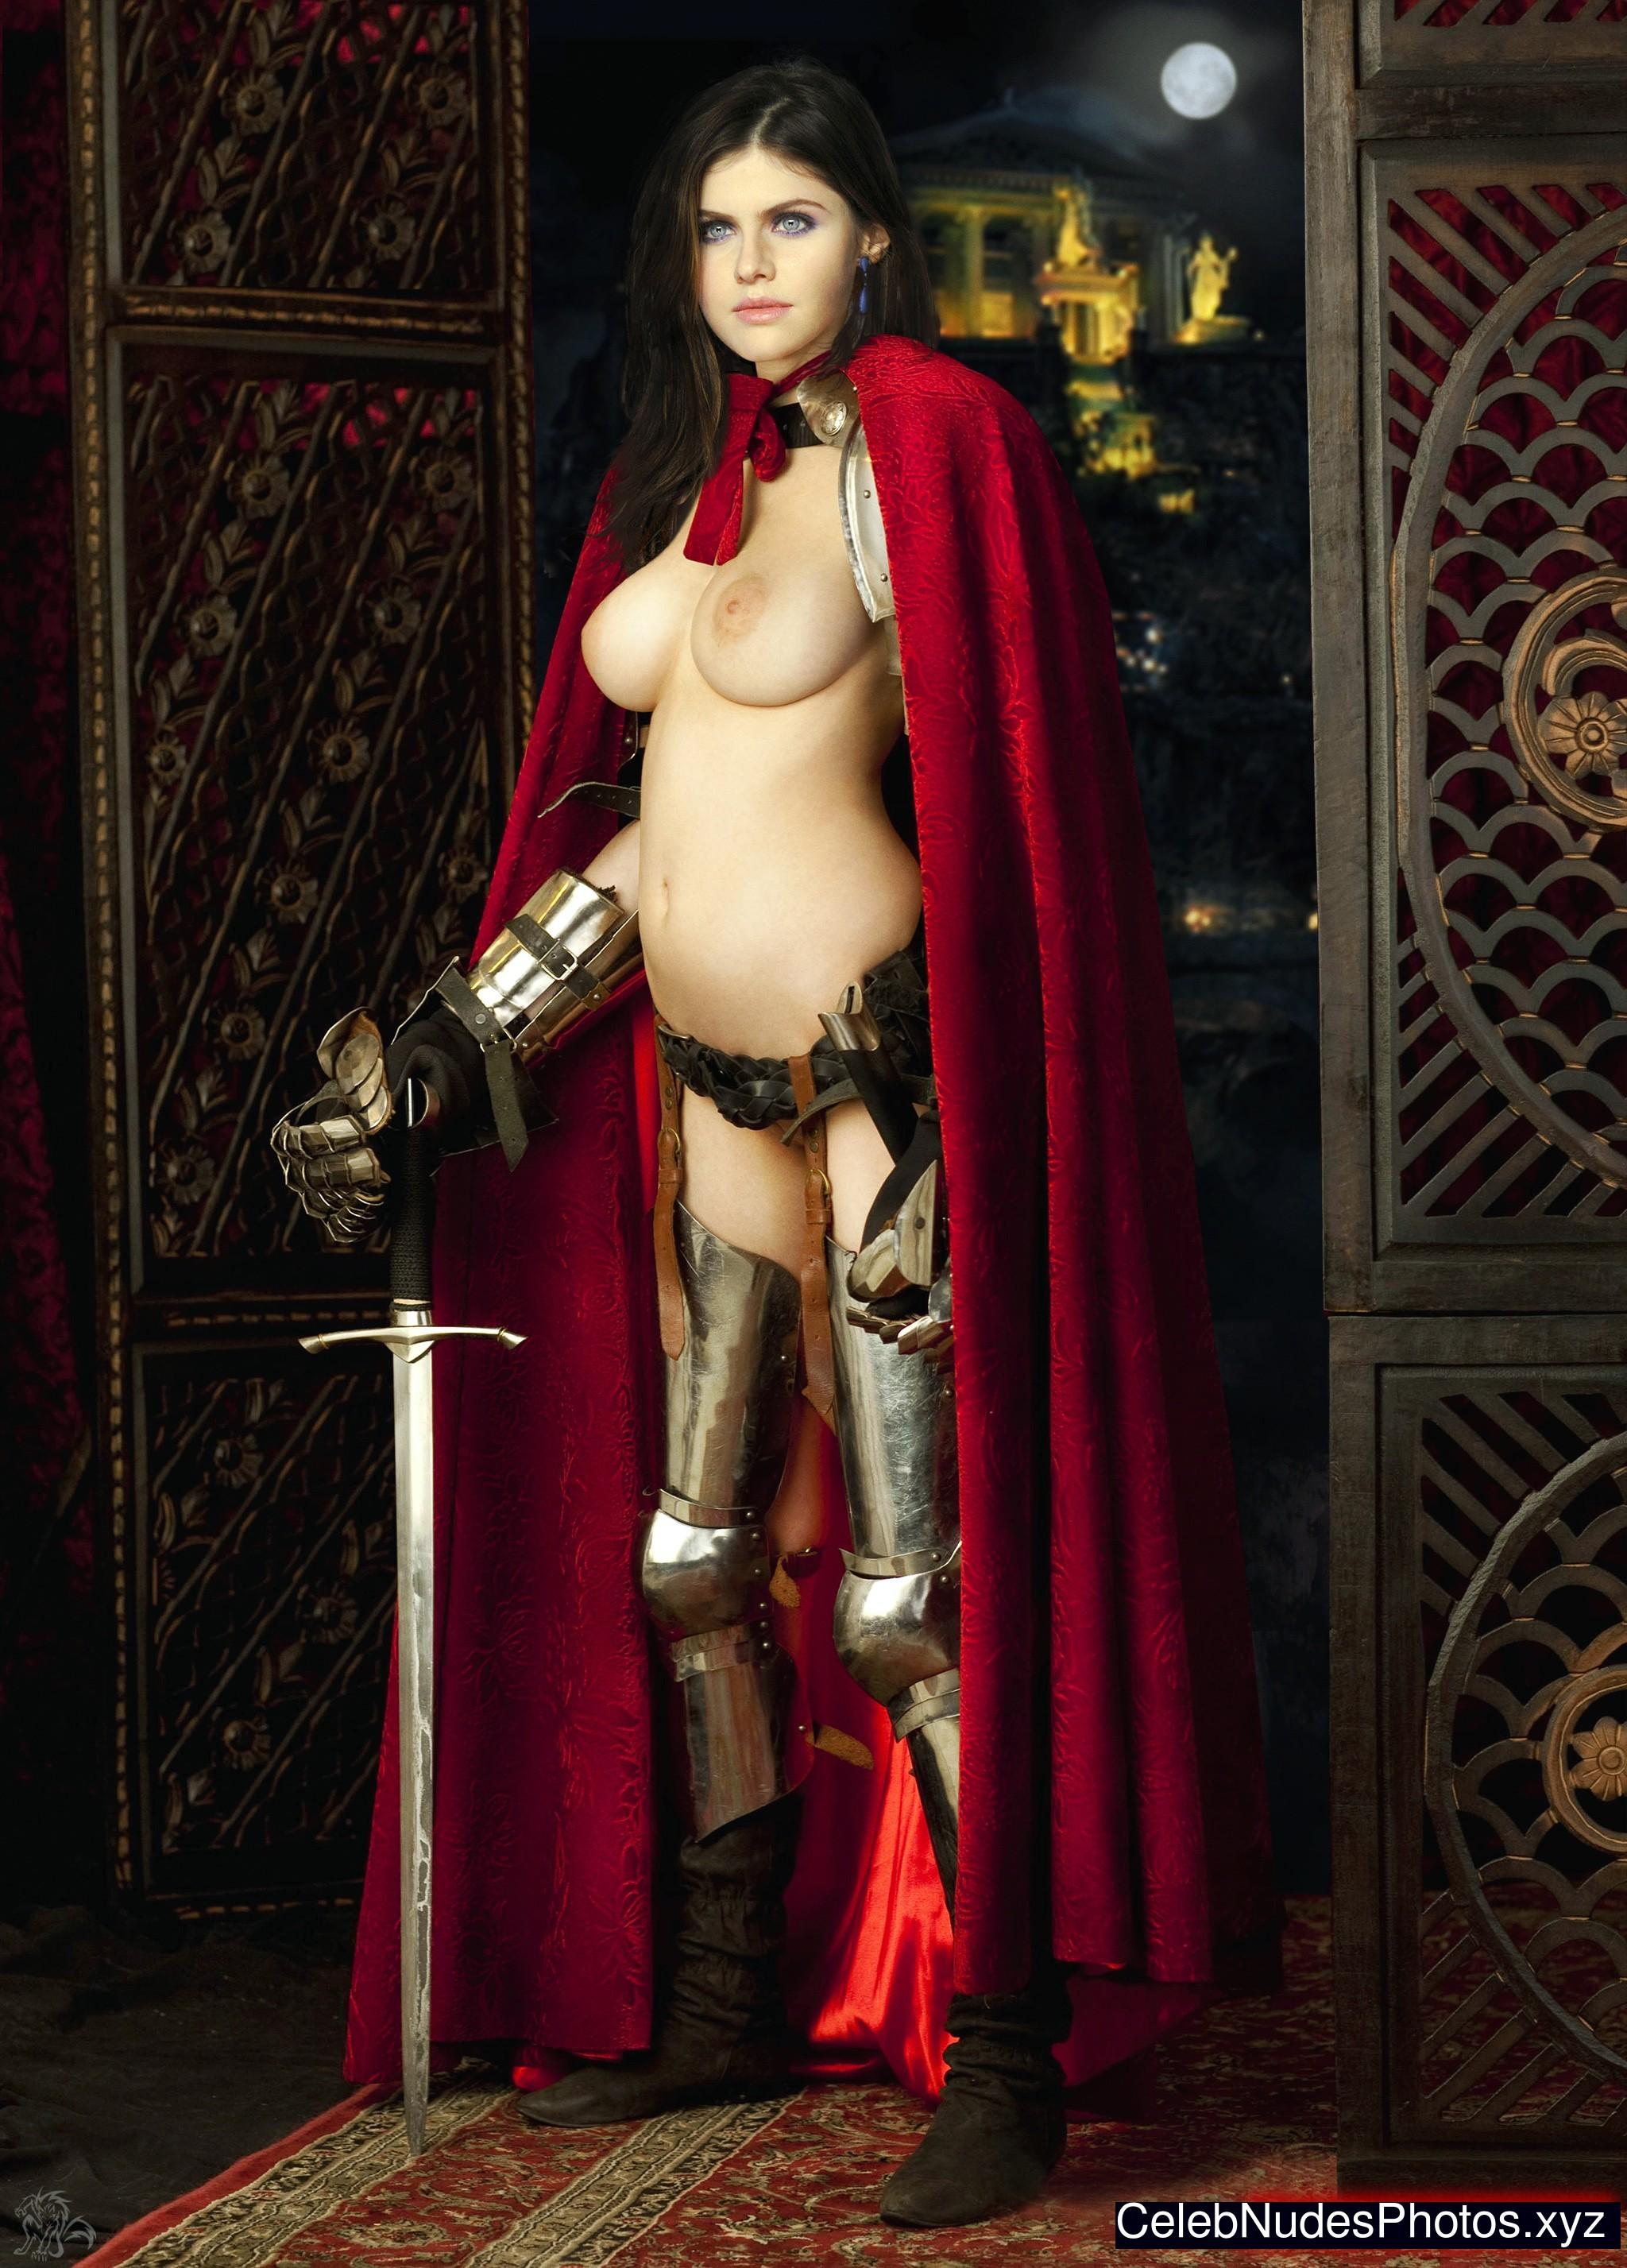 Alexandra Daddario nude celebrity pics